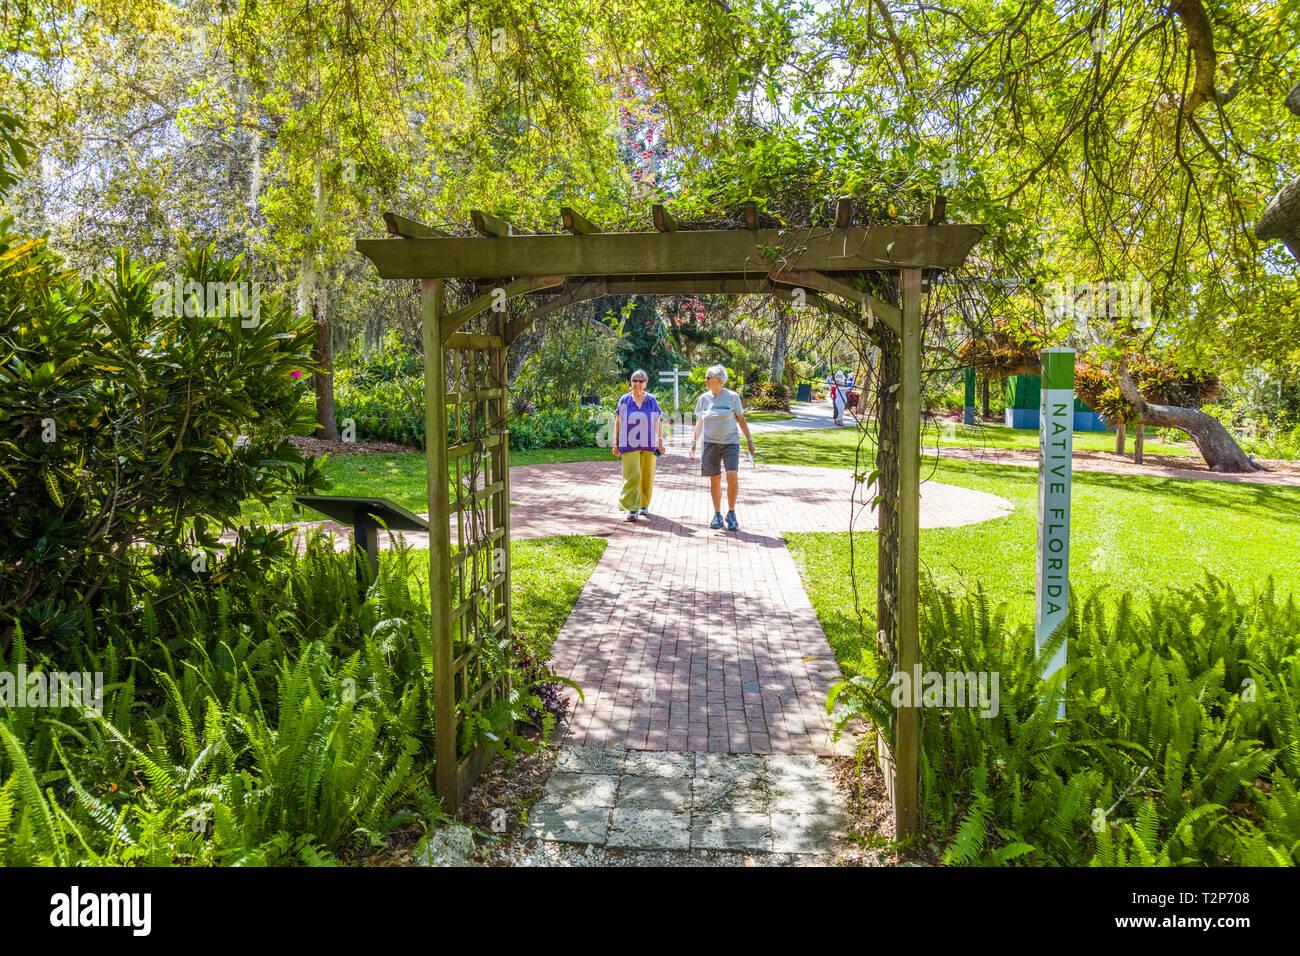 Marie Selby Botanical Gardens in Sarasota Florida - Stock Image